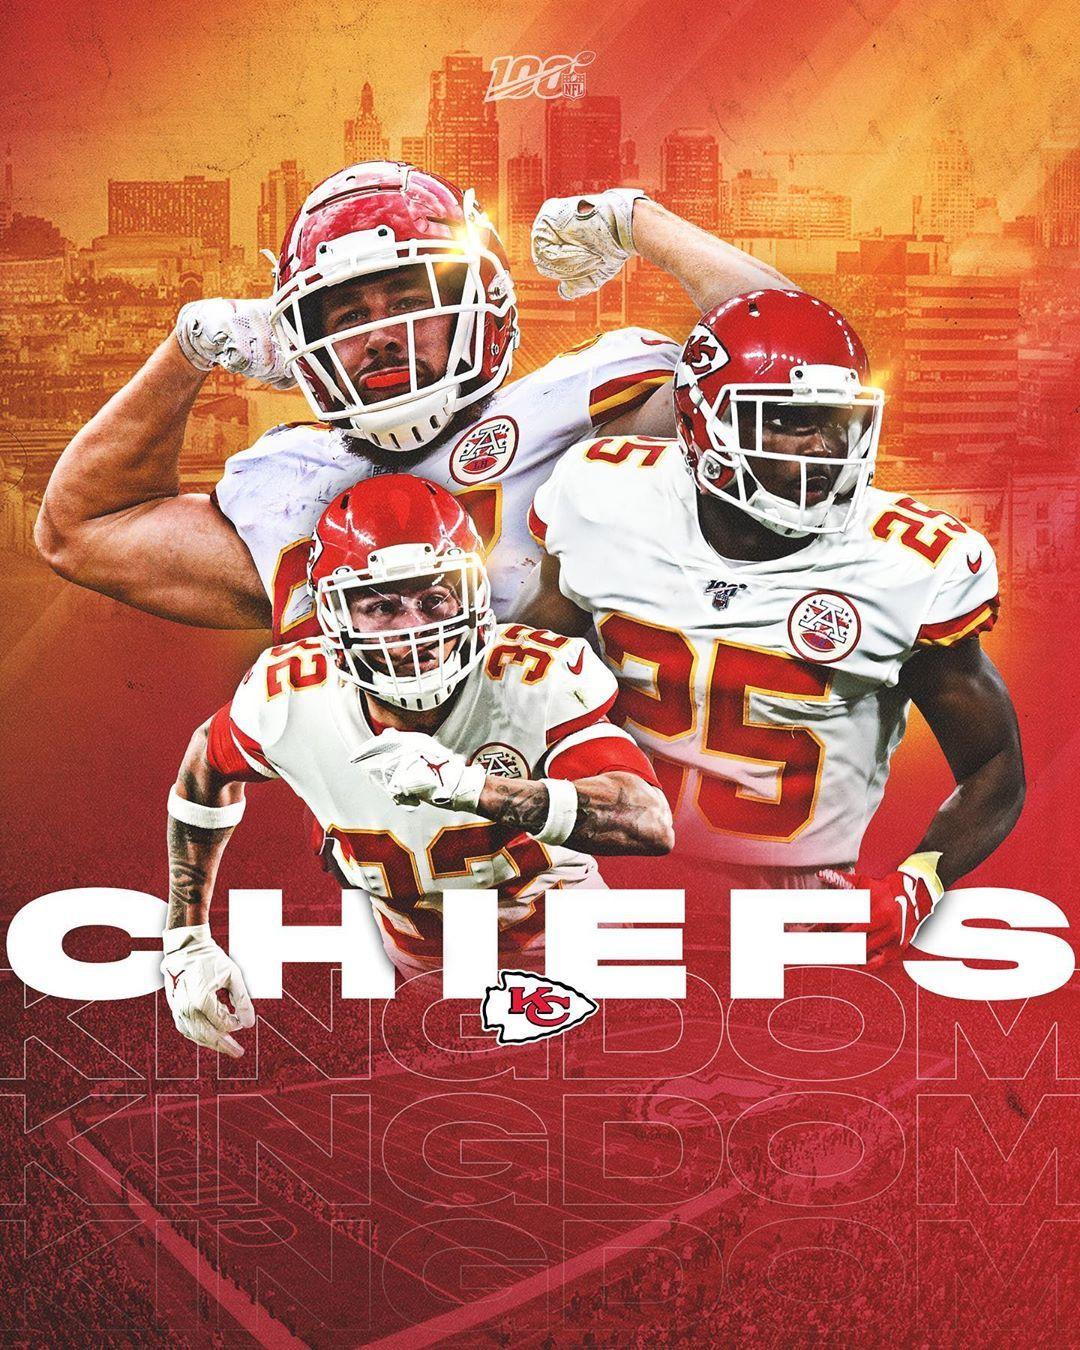 Nfl The Chiefs Improve To 5 2 Kcvsden Kansas City Chiefs Football Kansas City Chiefs Logo Kc Chiefs Football